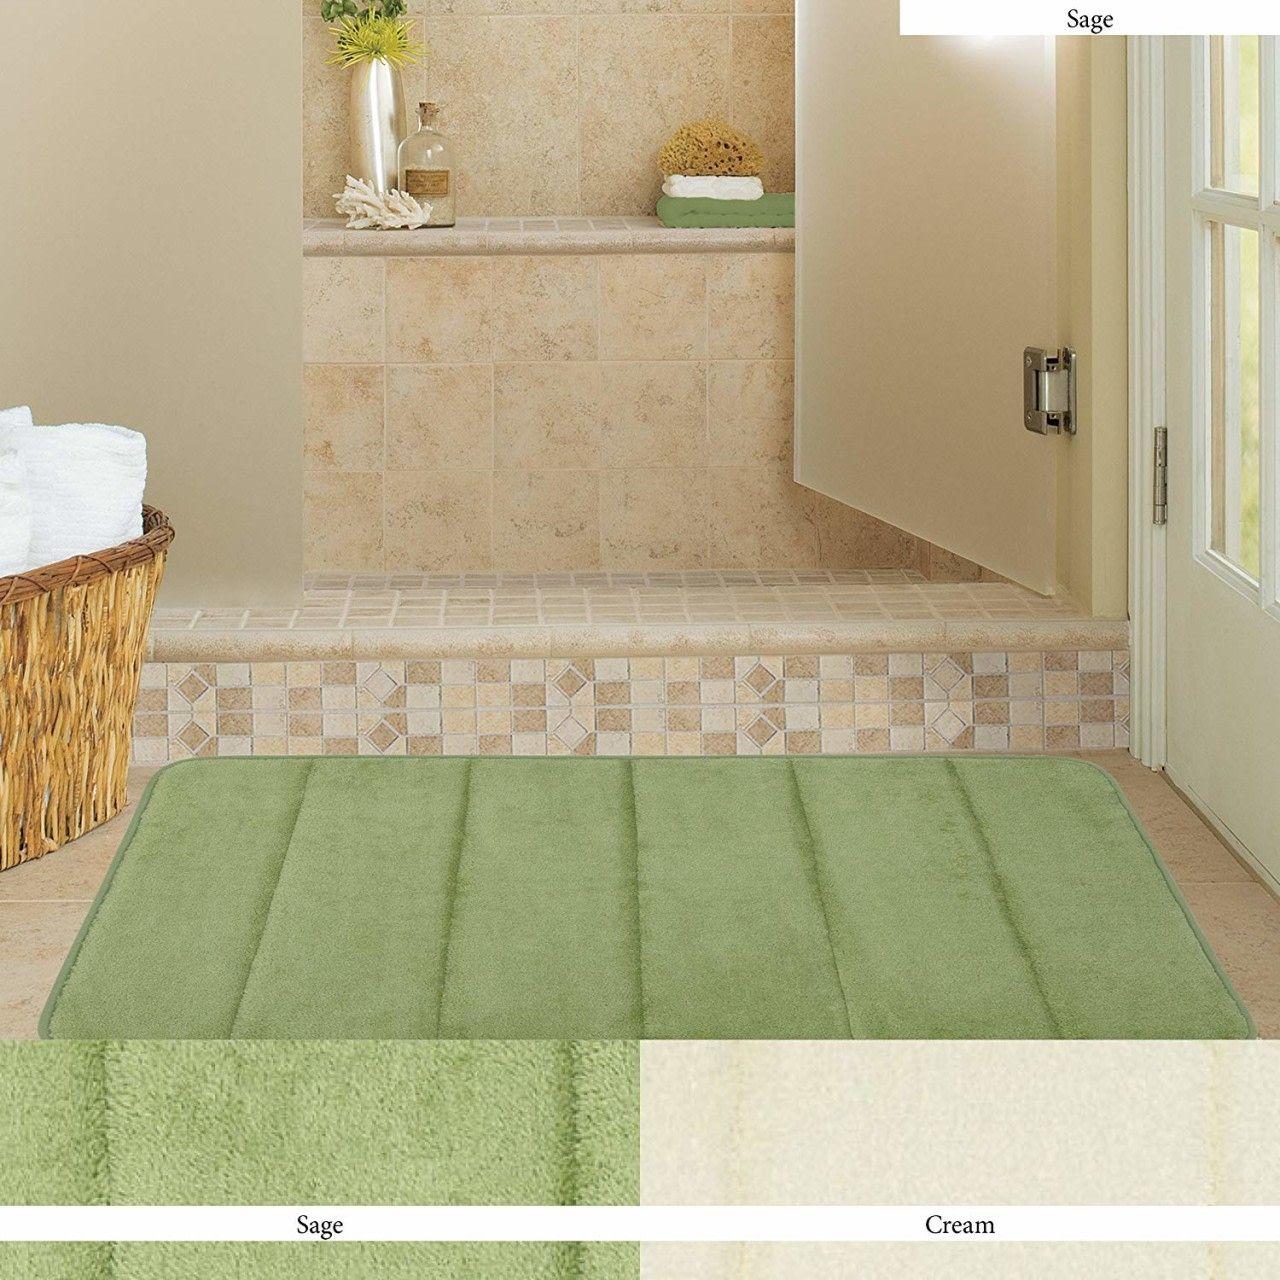 Mohawk Home Memory Foam Bath Rug In Sage Only 6 65 Free